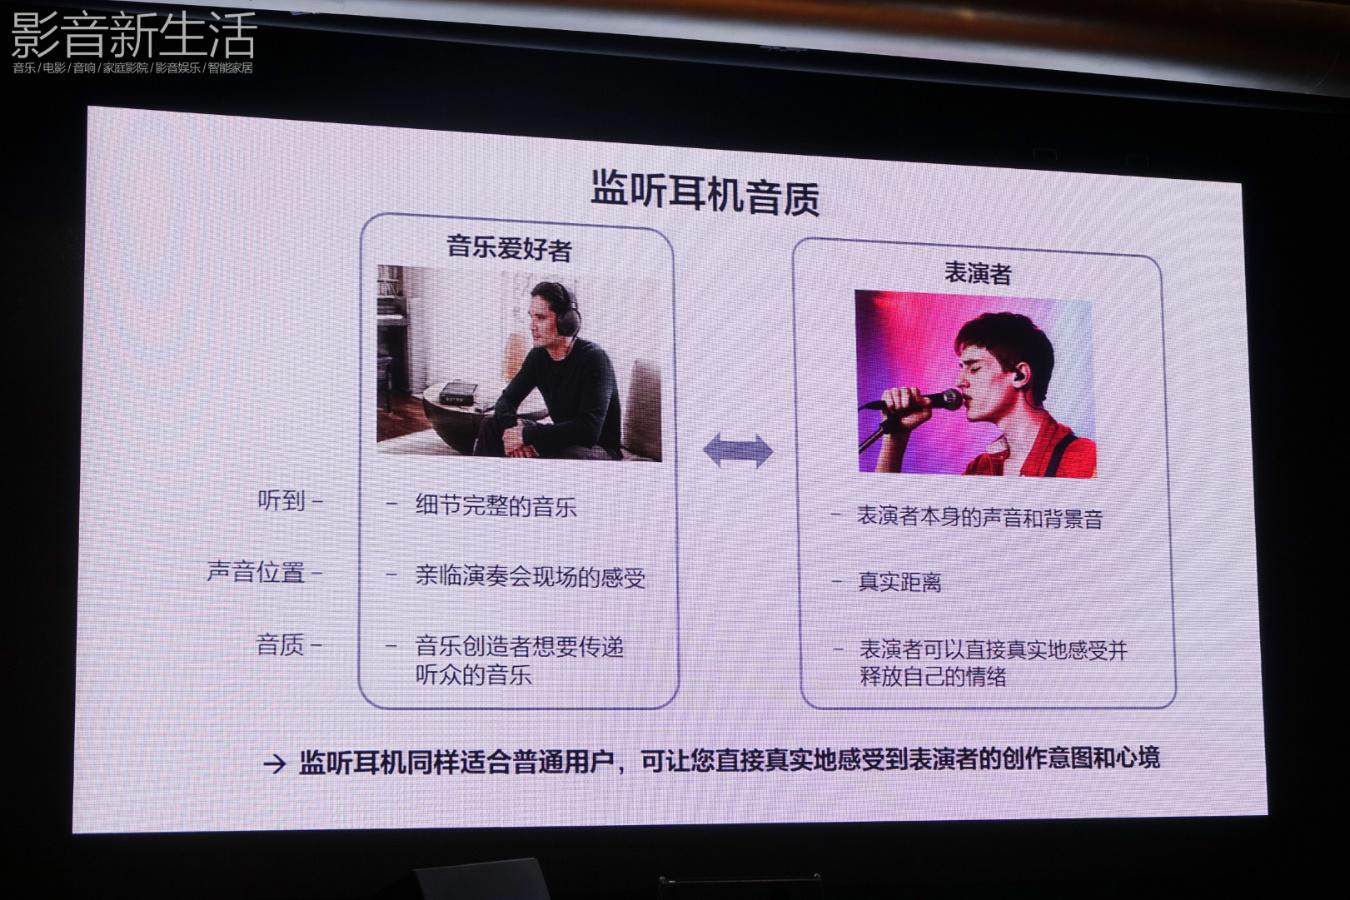 "Sony Hi Res 2018 16 - 新品 | ""重塑随身音乐娱乐王朝!"":Sony索尼发布Signature醇音系列新兄弟IER-Z1R和DMP-Z1,以及舞台监听耳机系列:IER-M7和IER-M9,还有升级款MDR-Z7M2!"